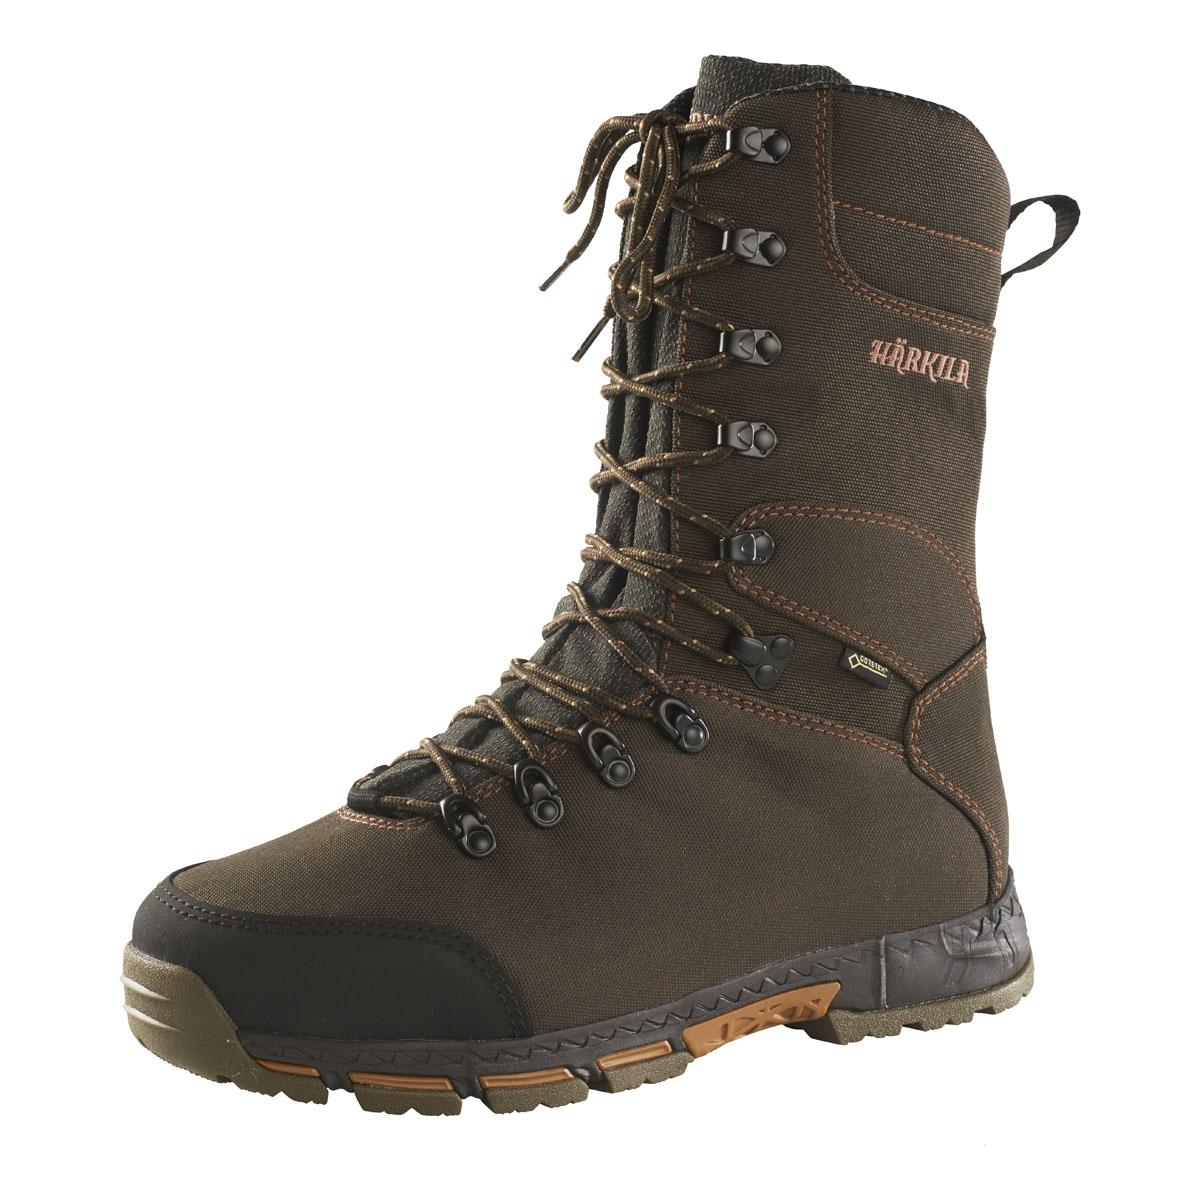 Harkila Light Gtx 10 Inch Dog Keeper Walking Boots Men S Dark